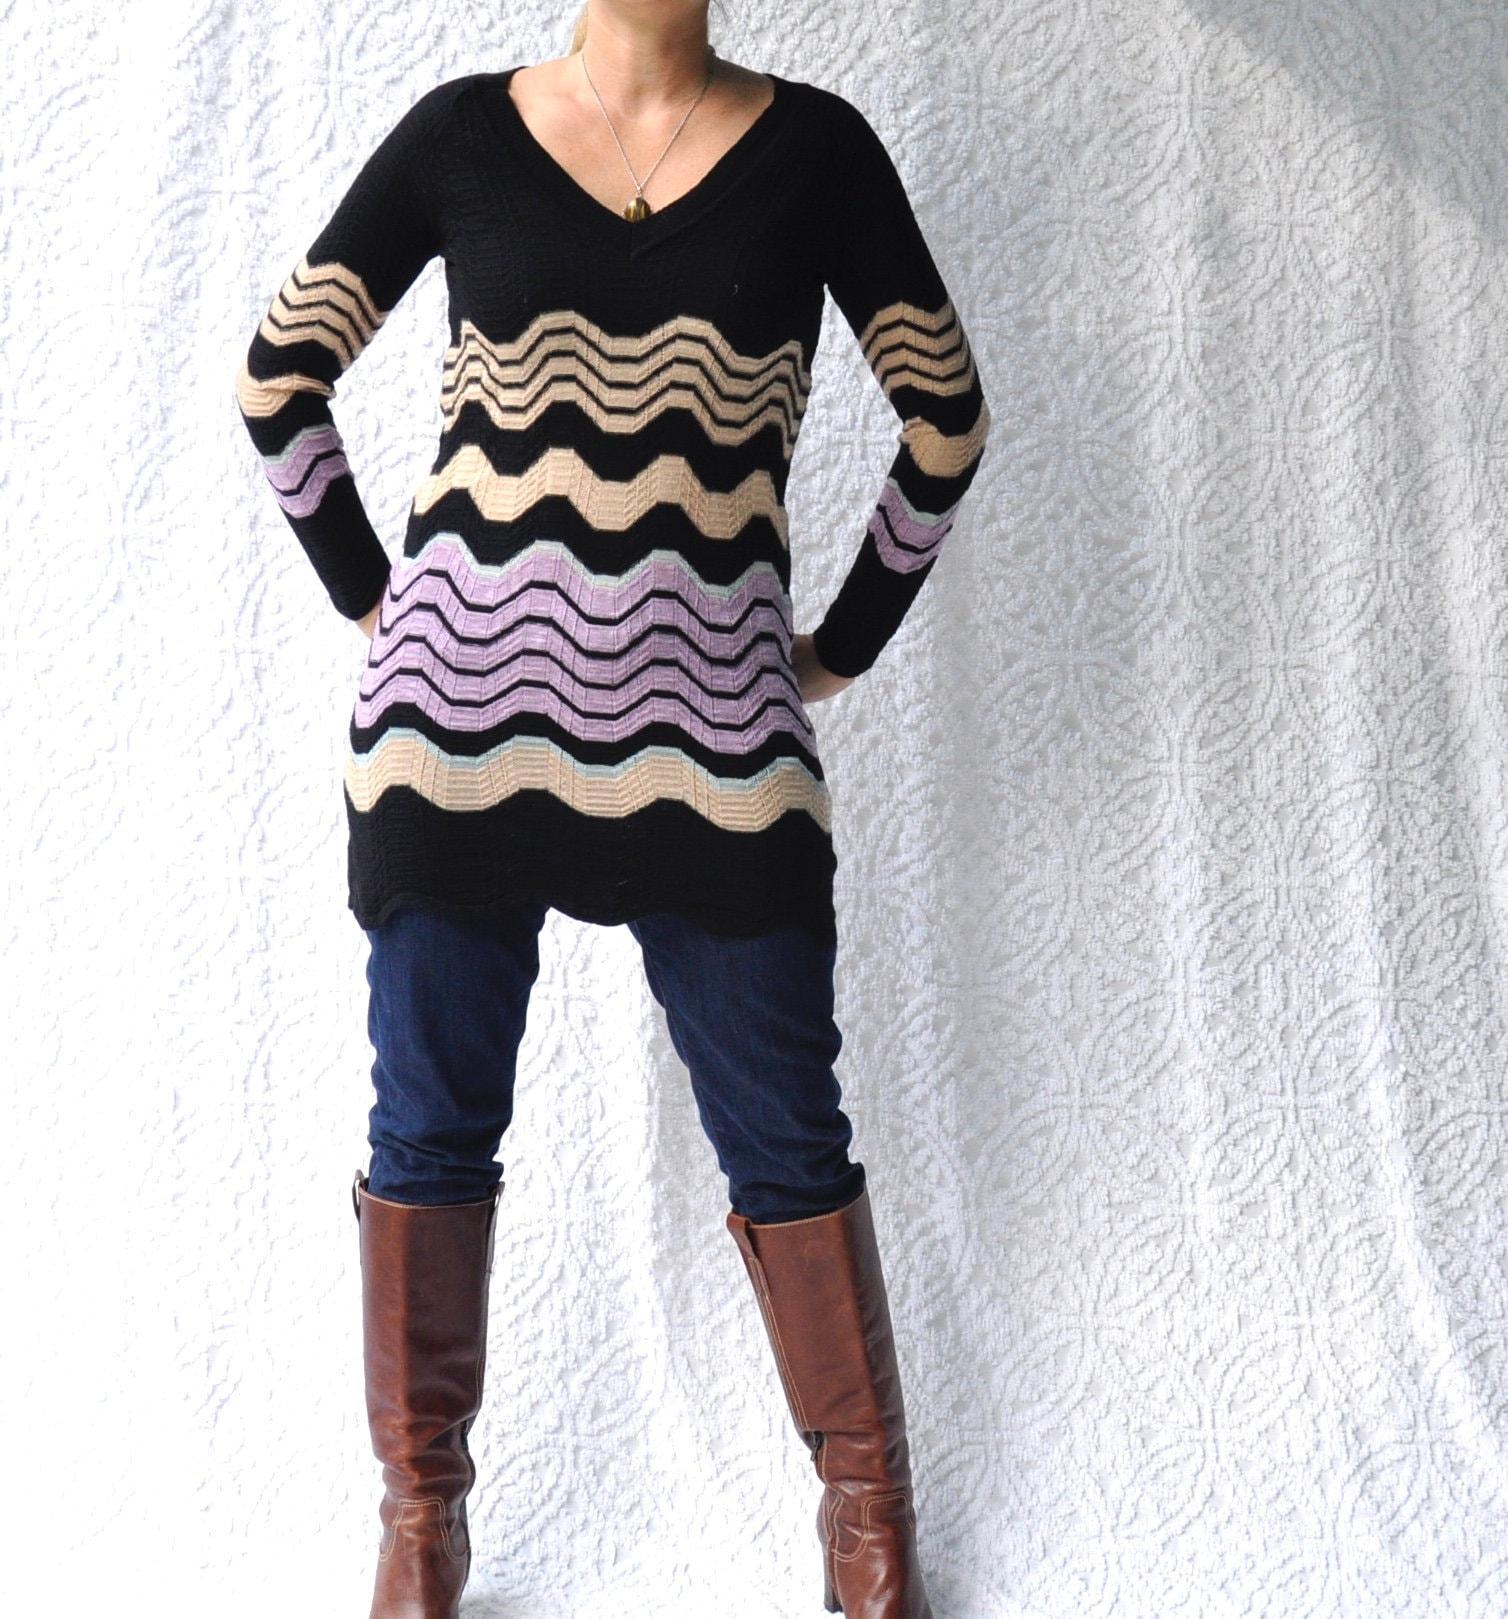 acc24dbfb10 Missoni Made in Italy Tunic Sweater Dress Knit Missoni Mini